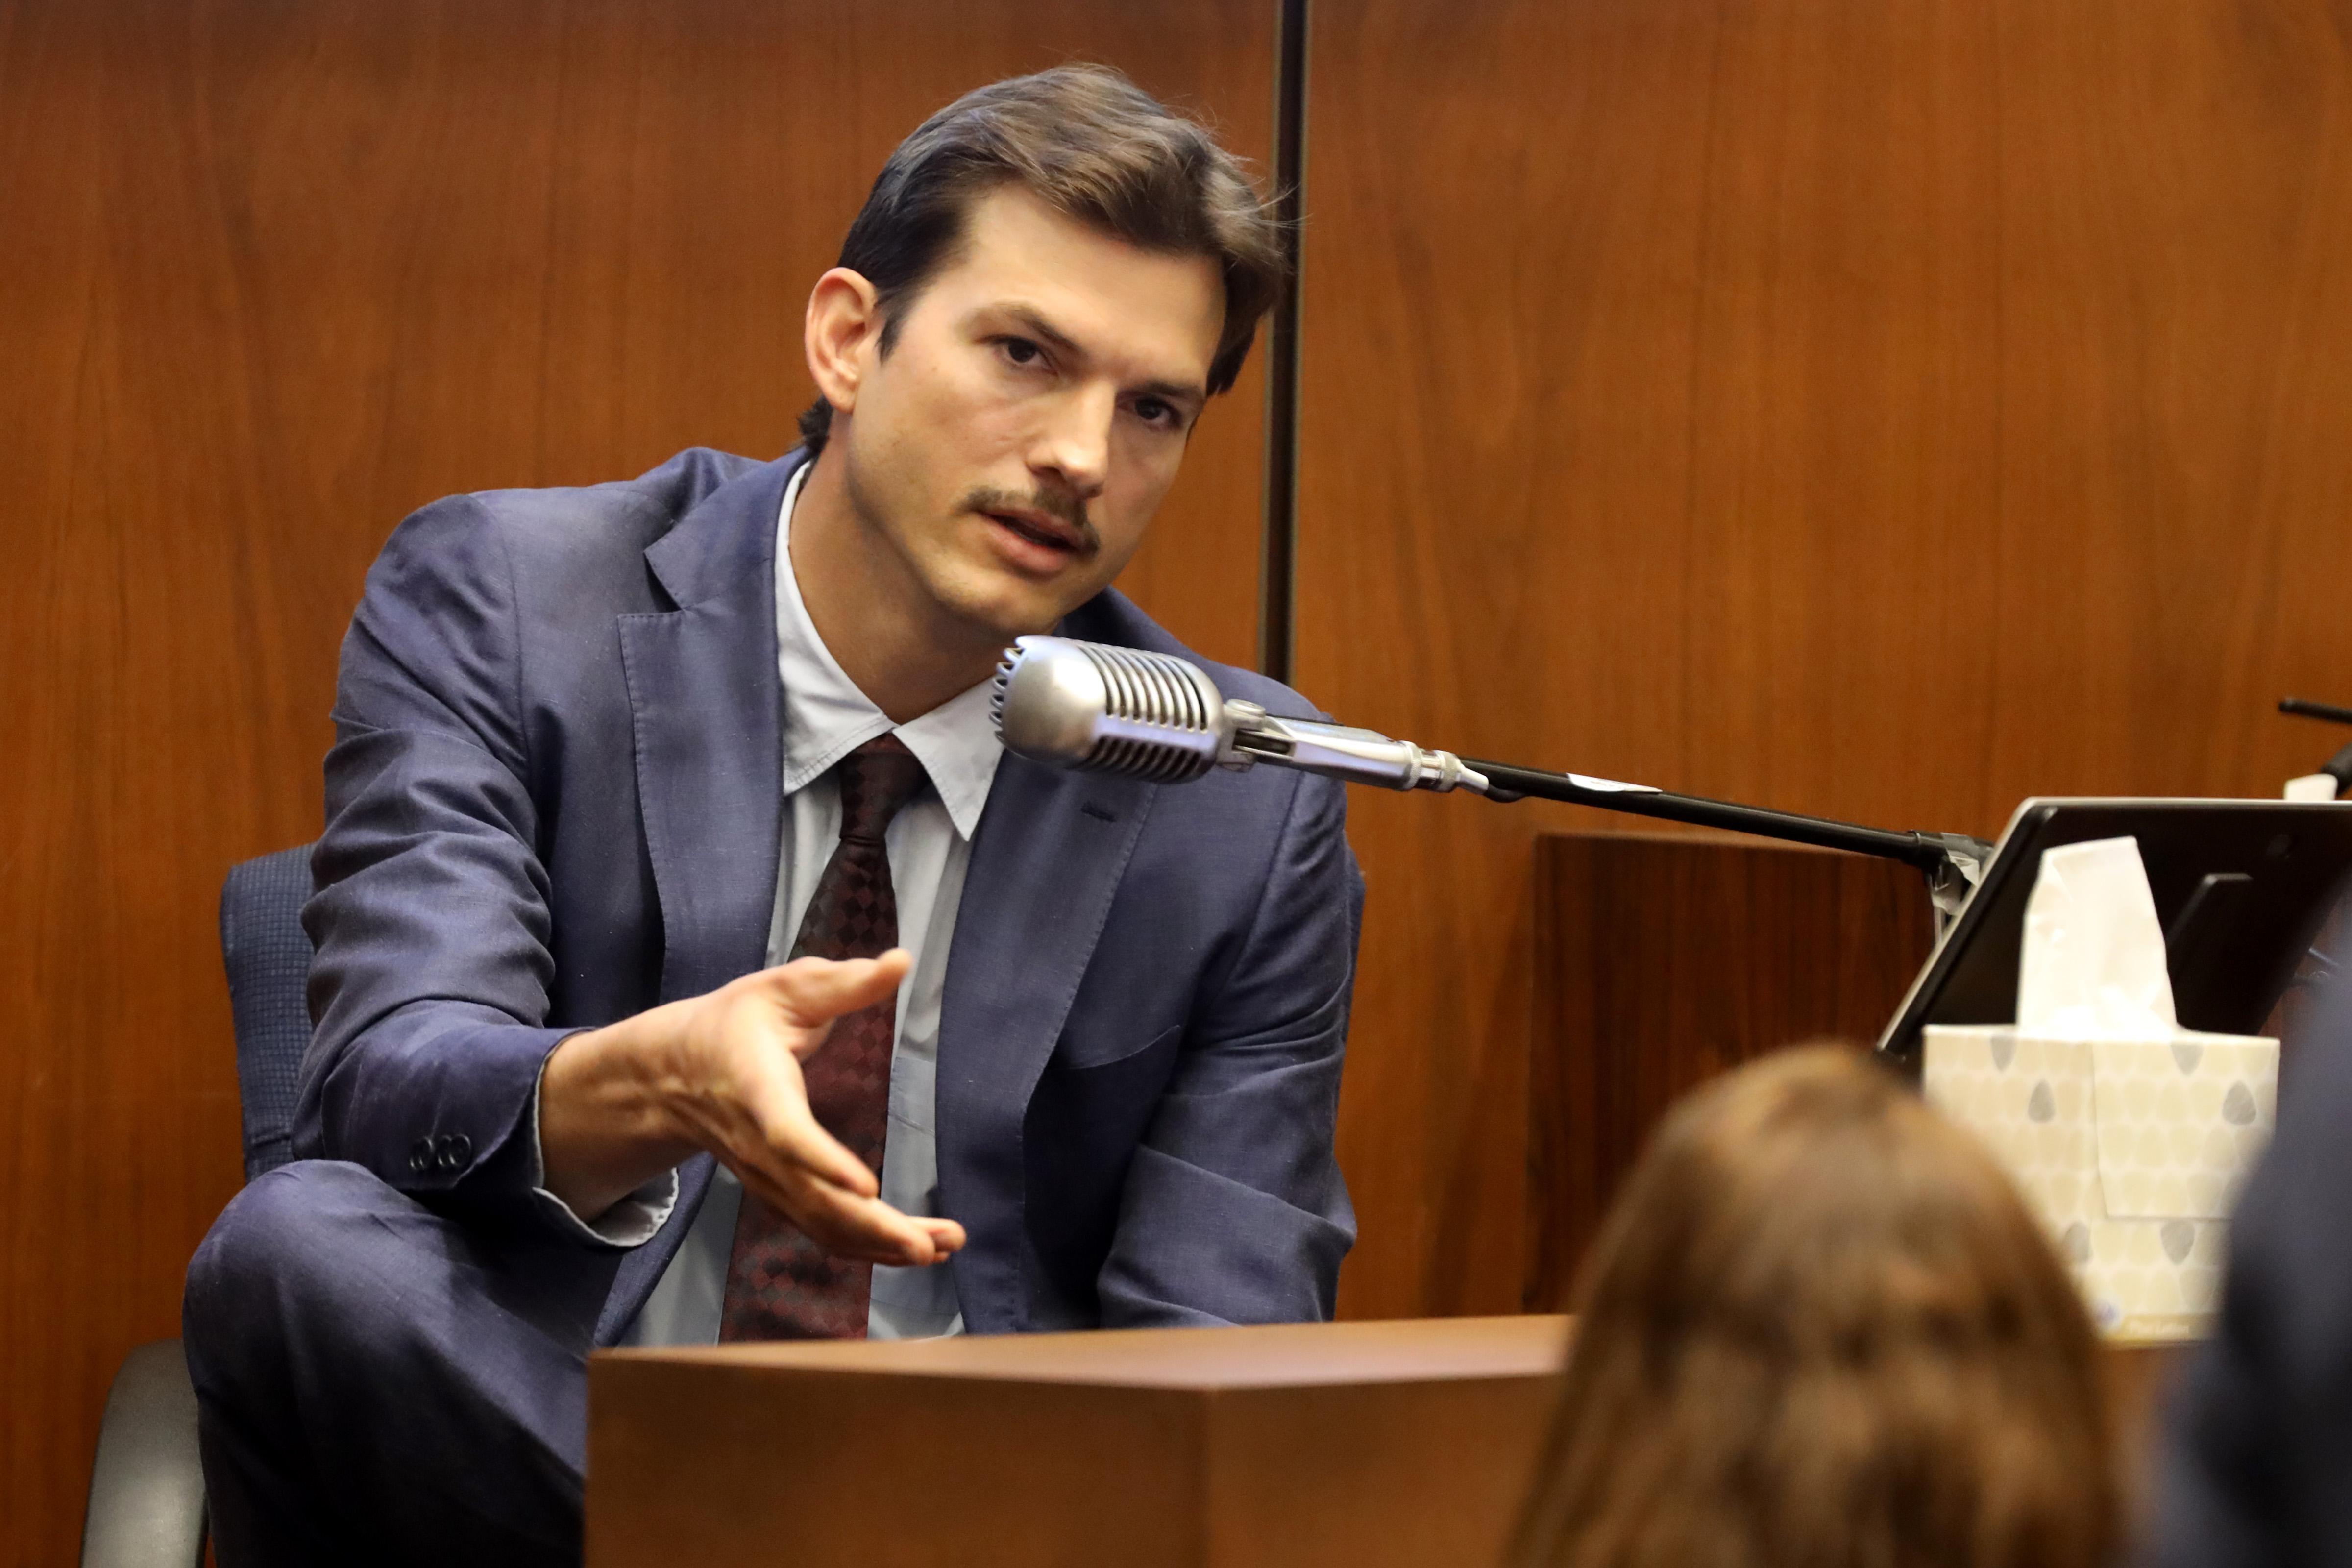 Ashton Kutcher testifies during the trial of alleged serial killer Michael Gargiulo